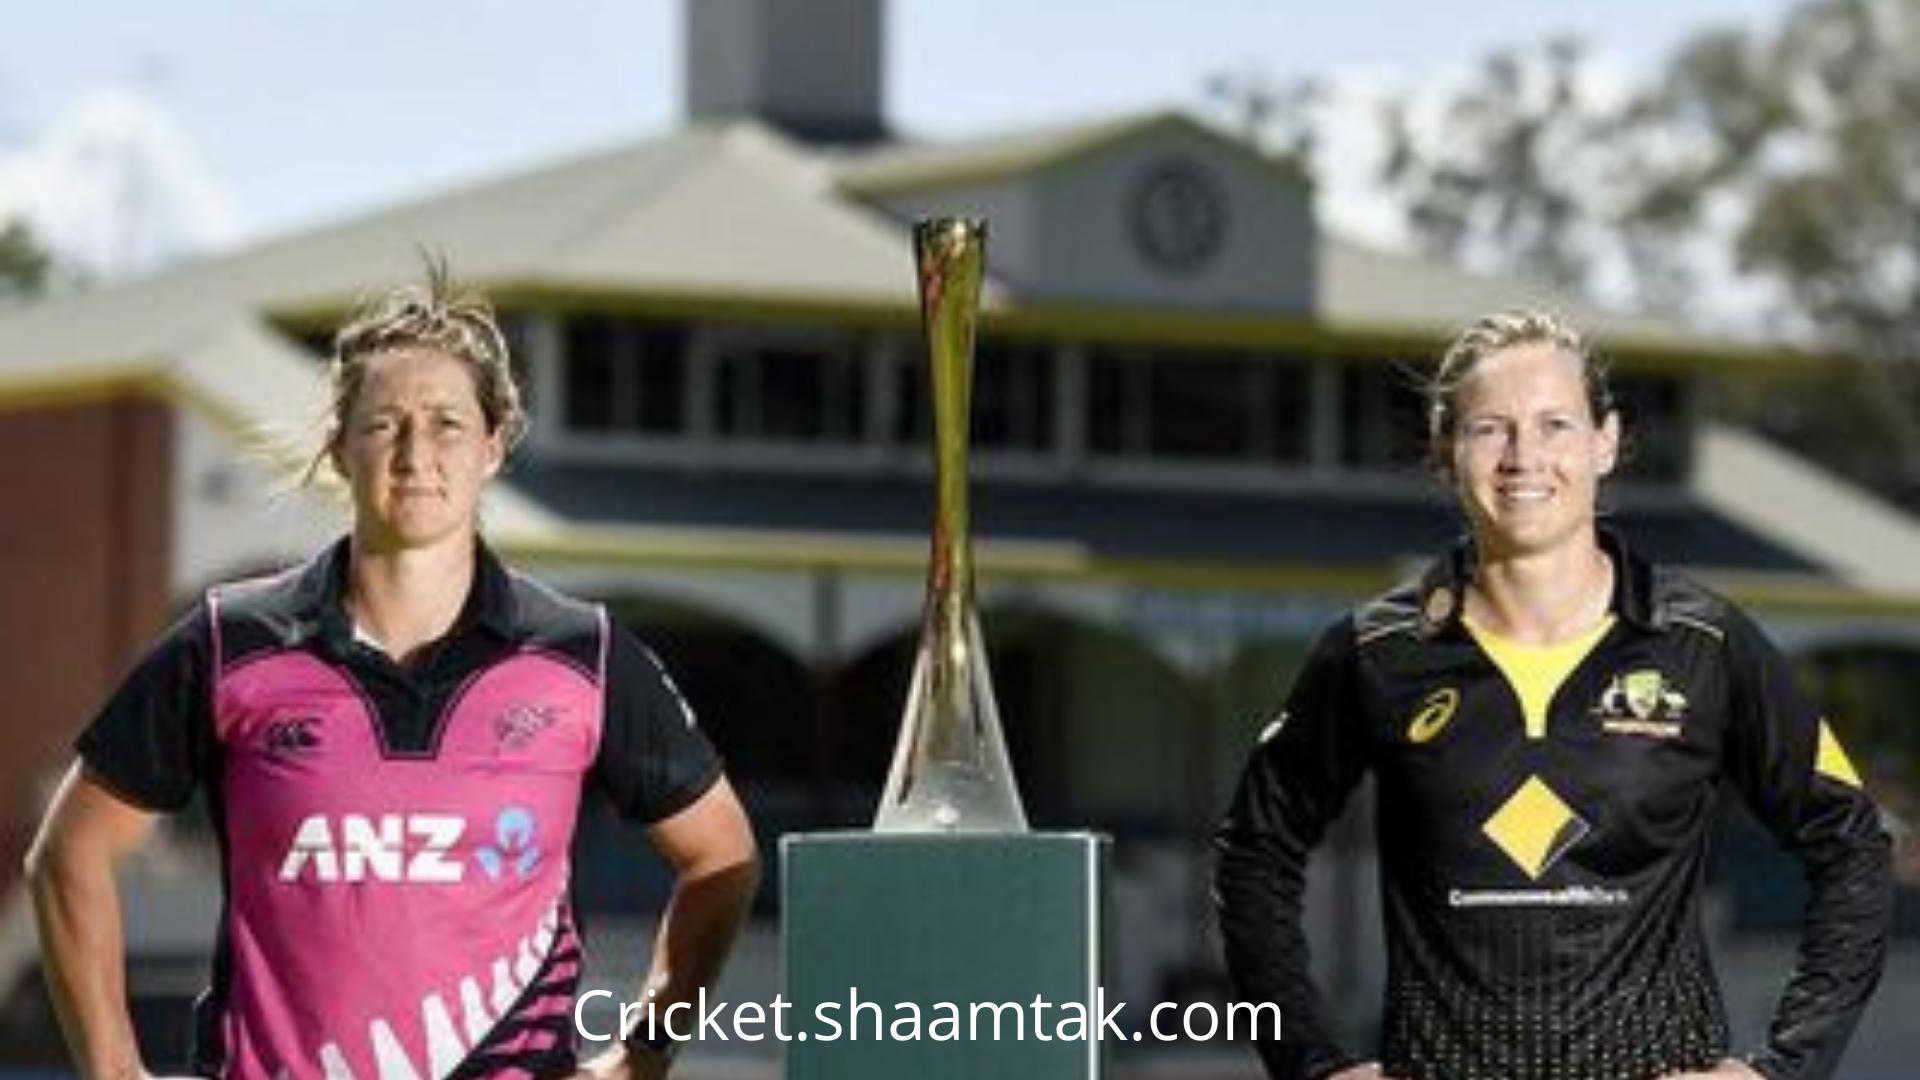 AUSW VS NZW : SERIES PREVIEW